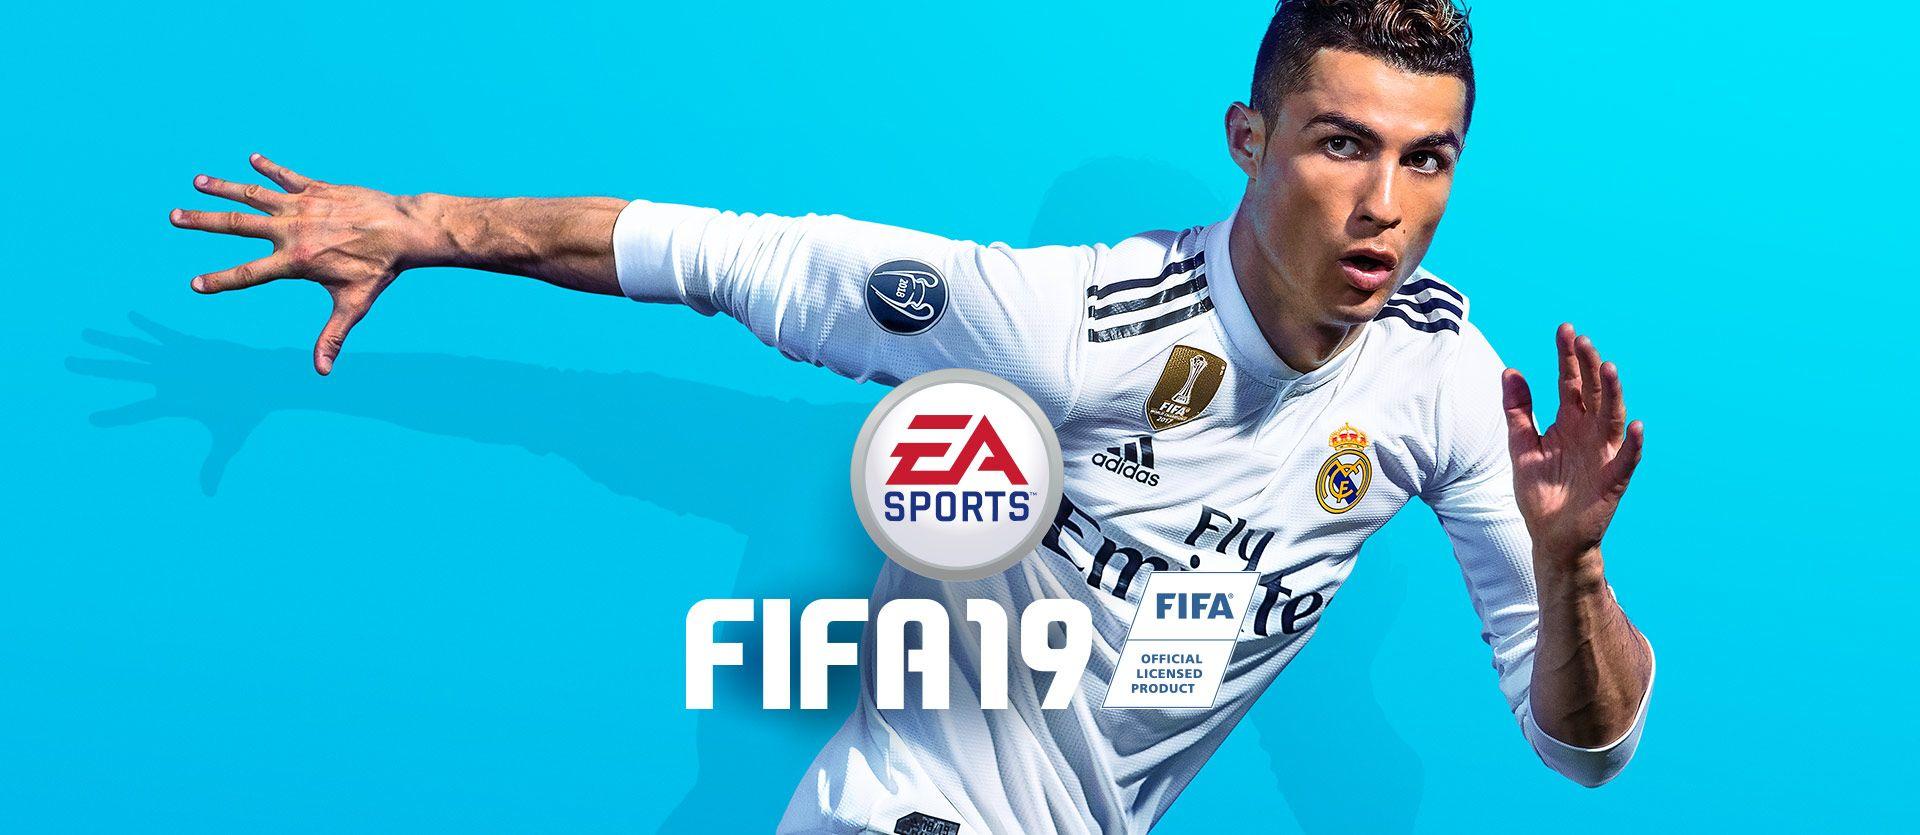 EA Sports FIFA 19، Cristiano Ronaldo running Ps4 games